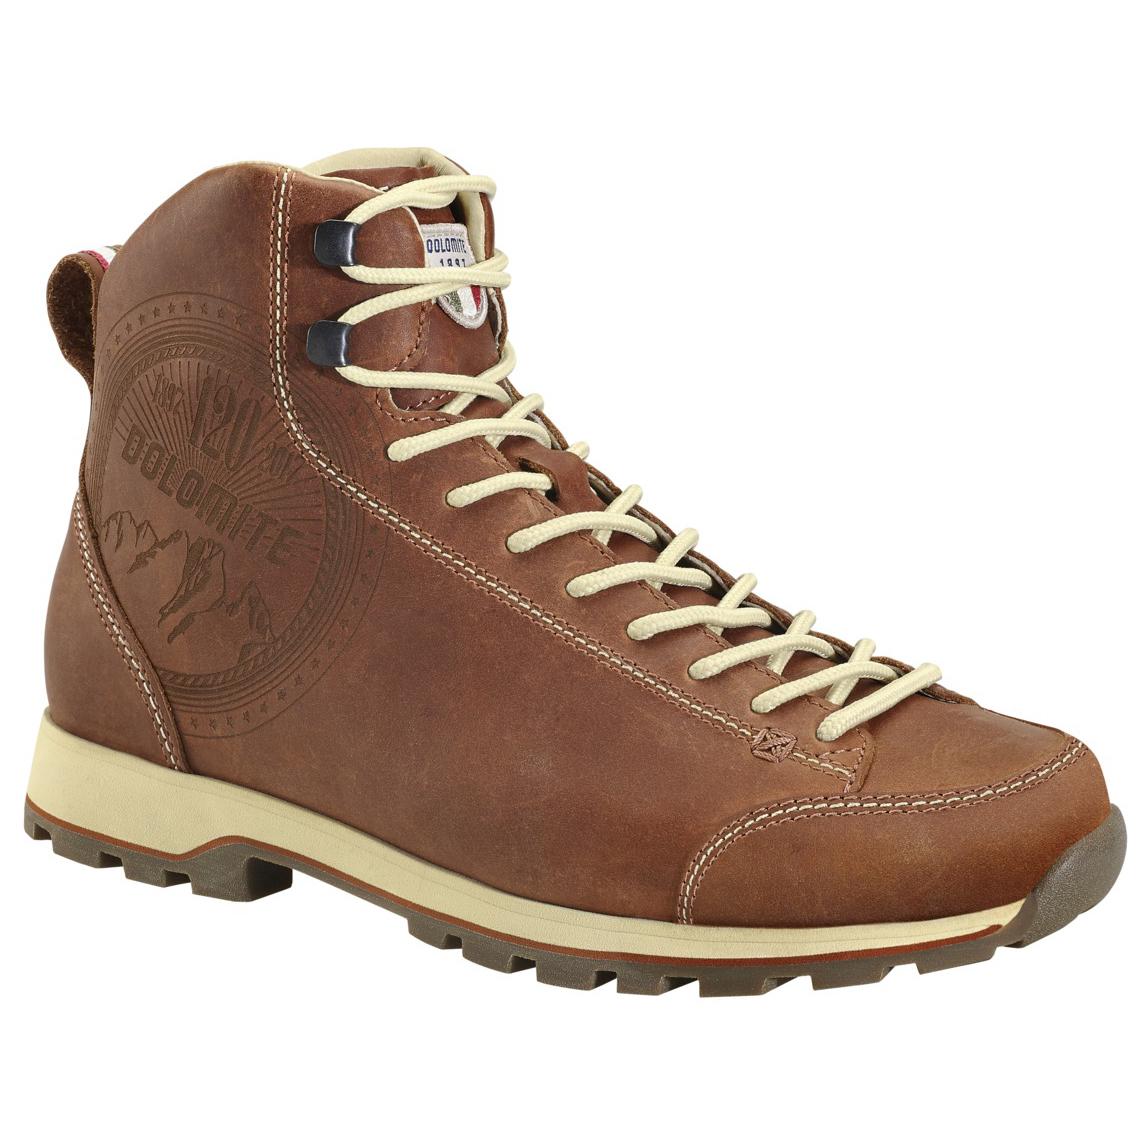 4d0dd665ccb dolomite-shoe-cinquantaquattro-special-hoge-schoenen.jpg